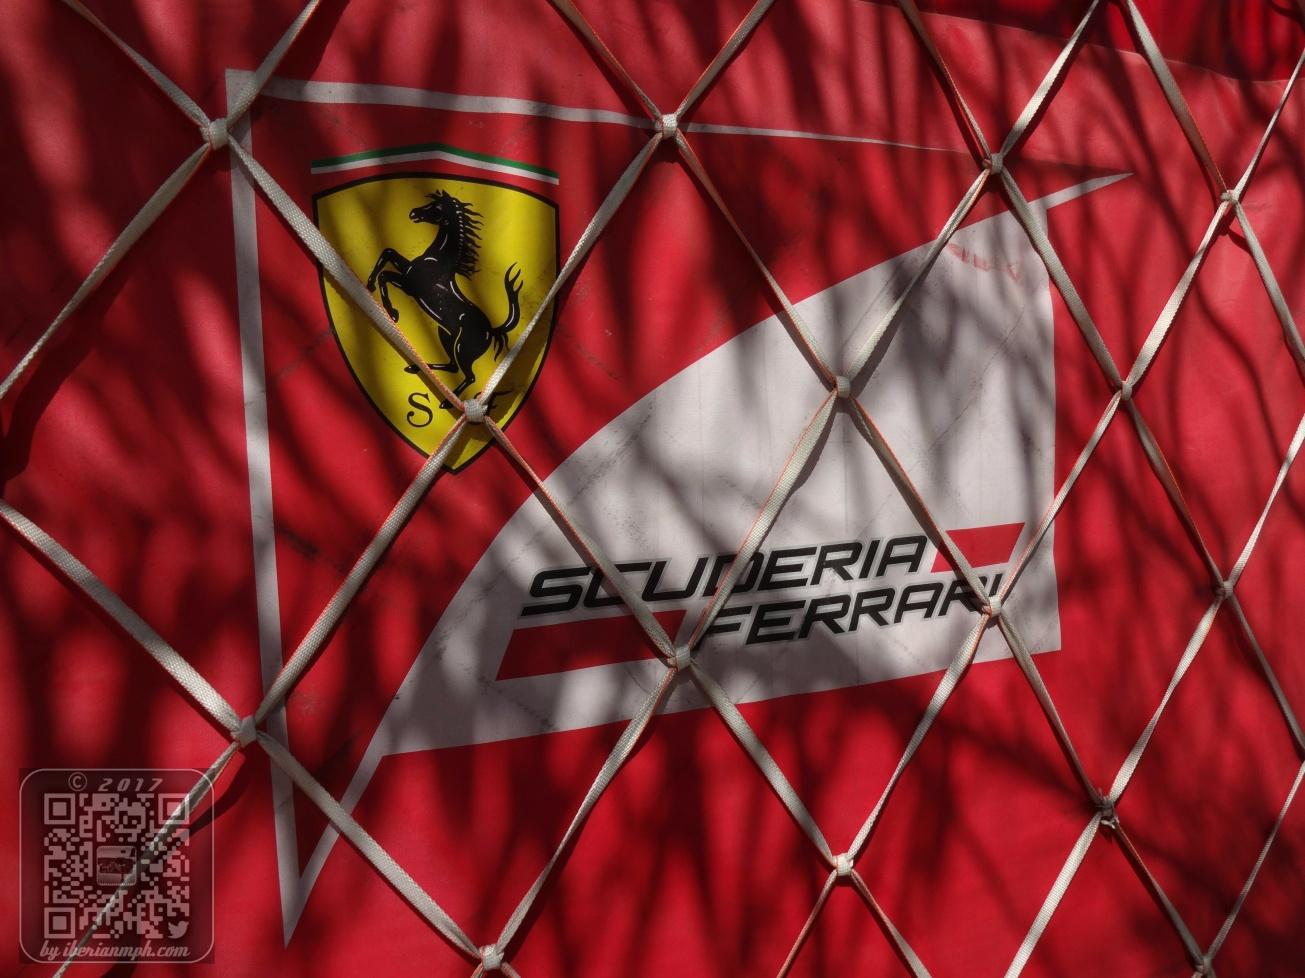 Hell hath no fury like a Ferrarista scorned!